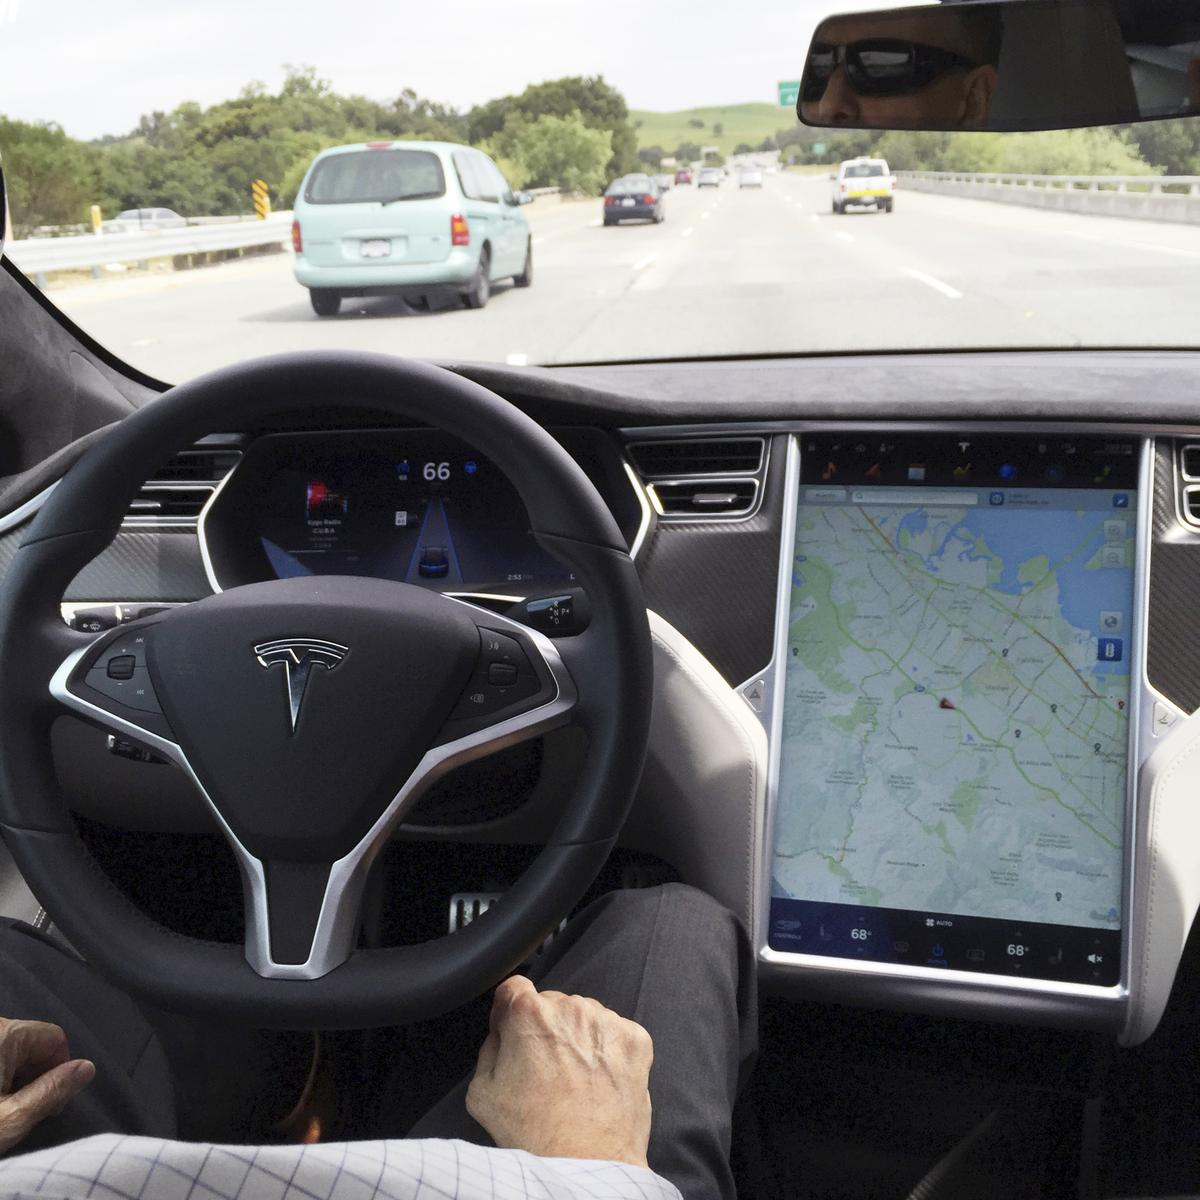 , NTSB faults Tesla, U.S. regulators in deadly 2018 Autopilot crash – Source Reuters Tech News, iBSC Technologies - learning management services, LMS, Wordpress, CMS, Moodle, IT, Email, Web Hosting, Cloud Server,Cloud Computing